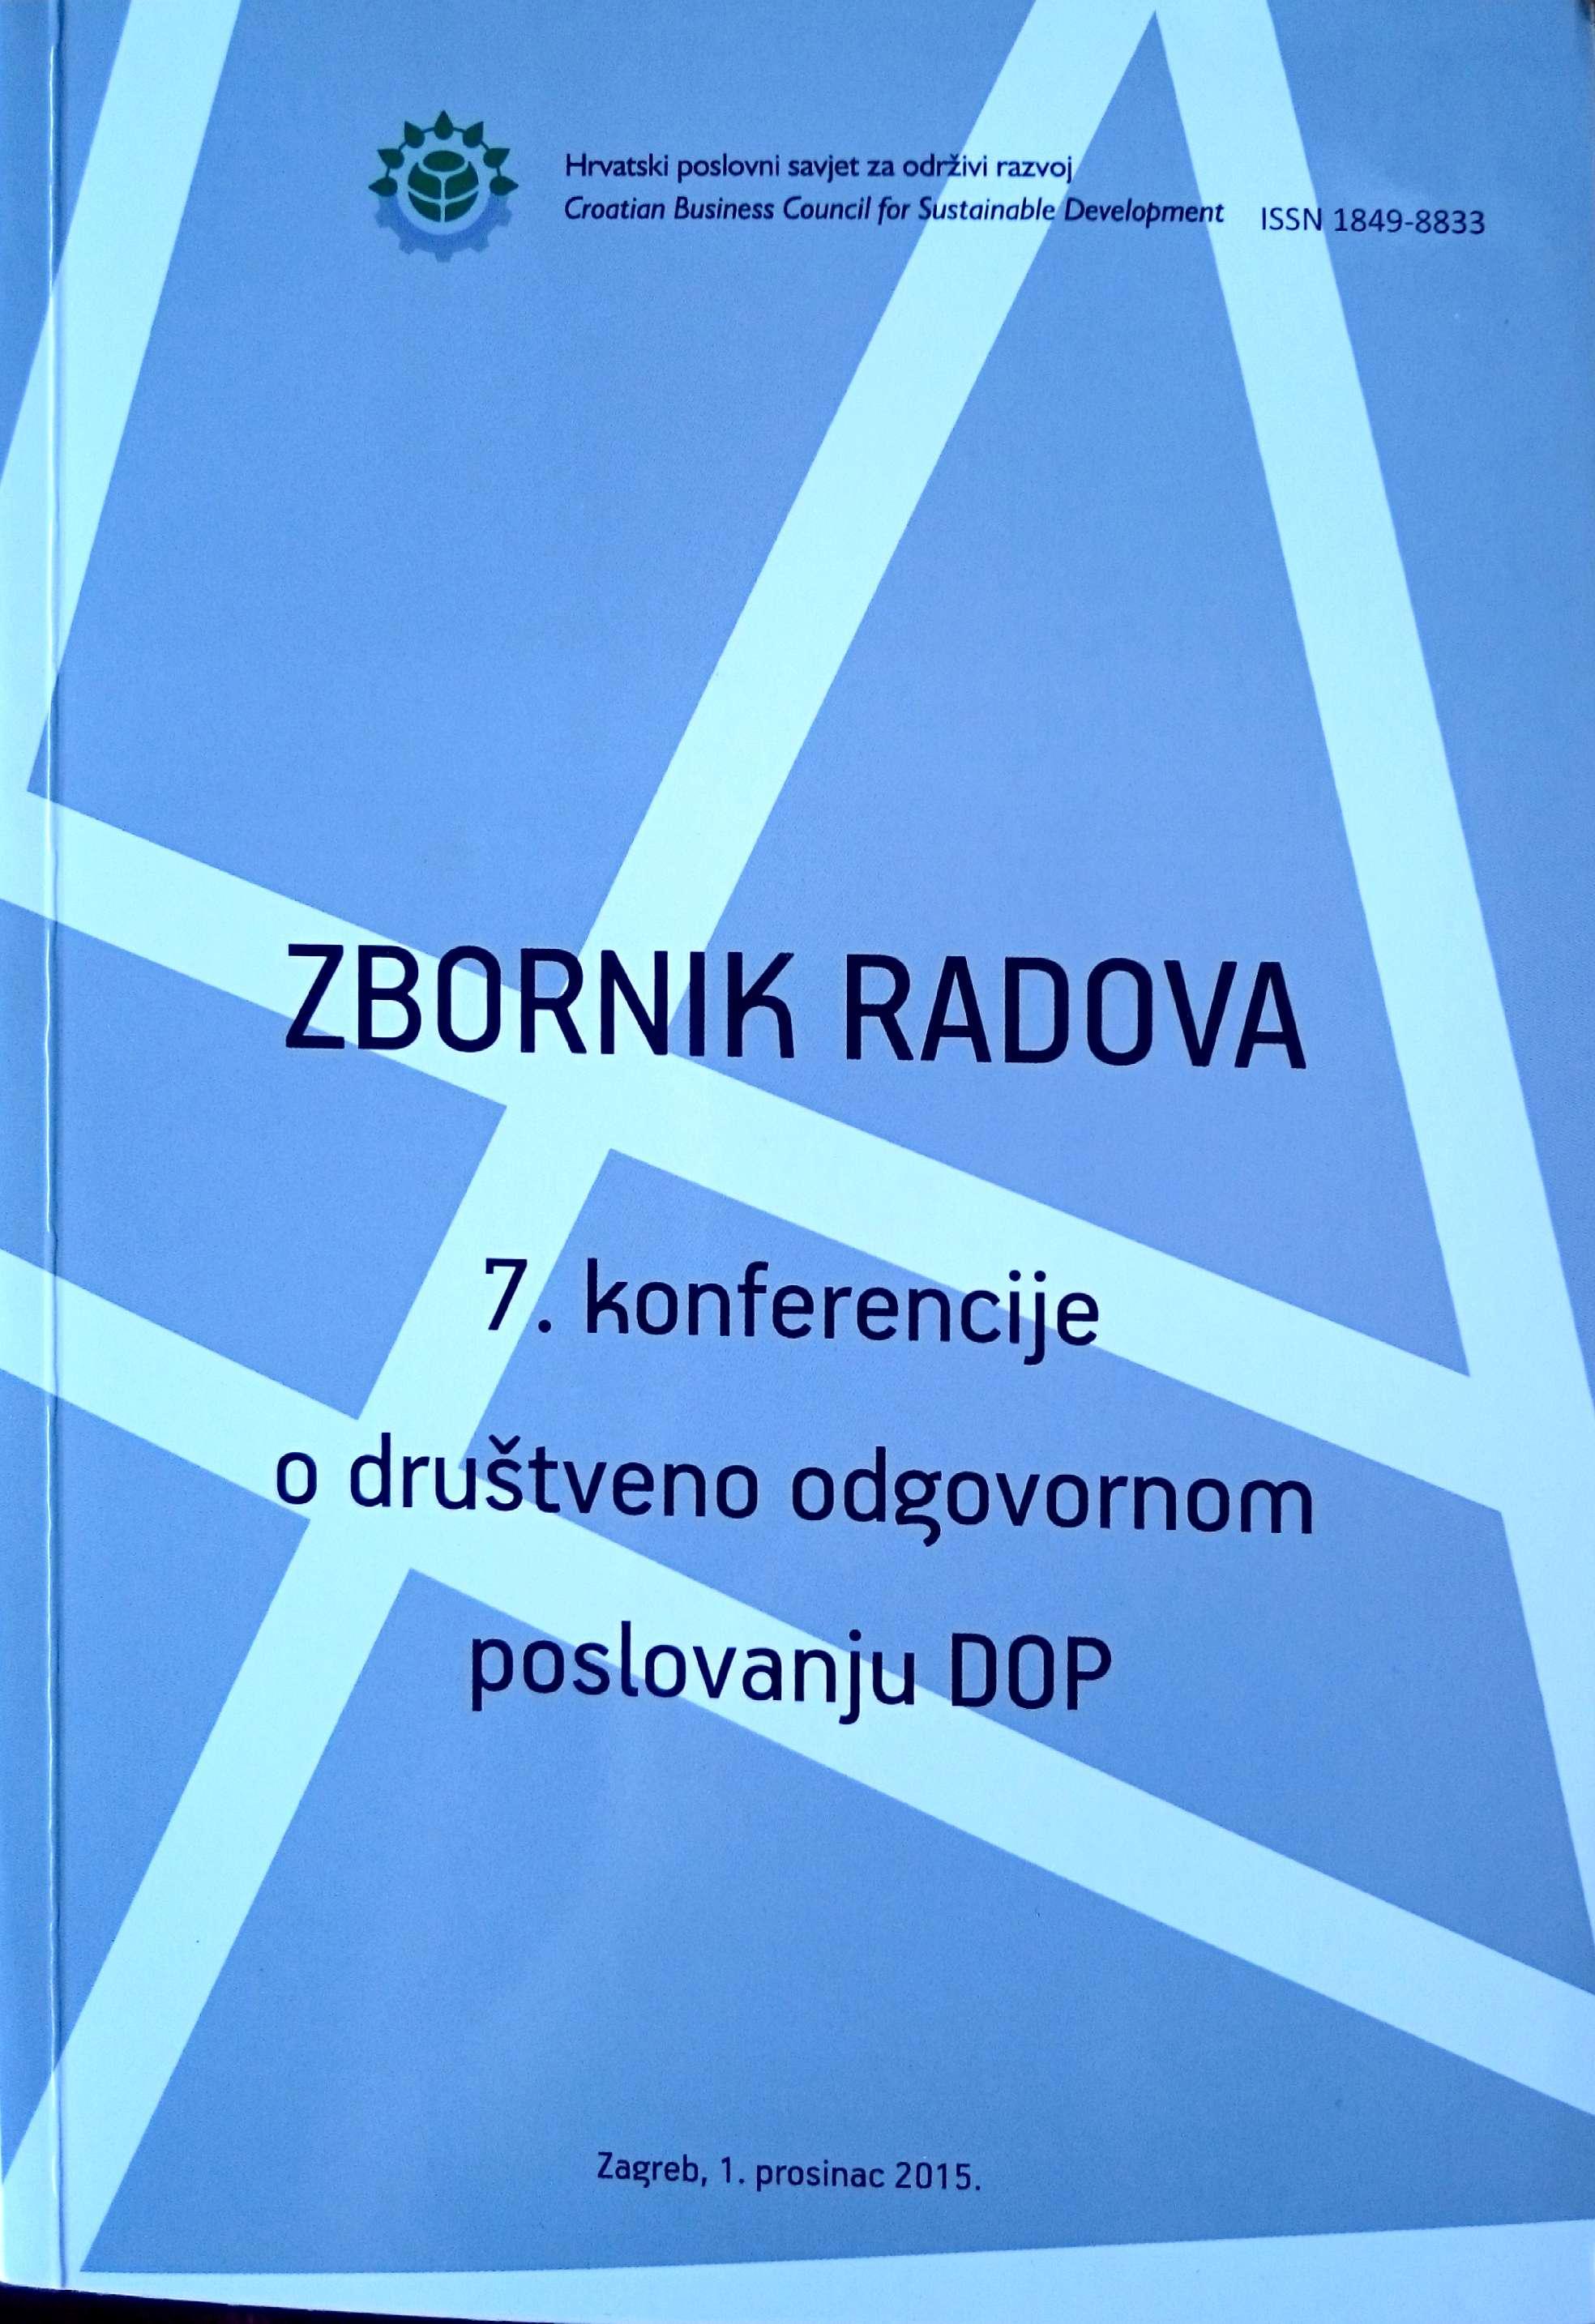 ZBORNIK RADOVA, 7. konferencija o društveno odgovornom poslovanju - DOP